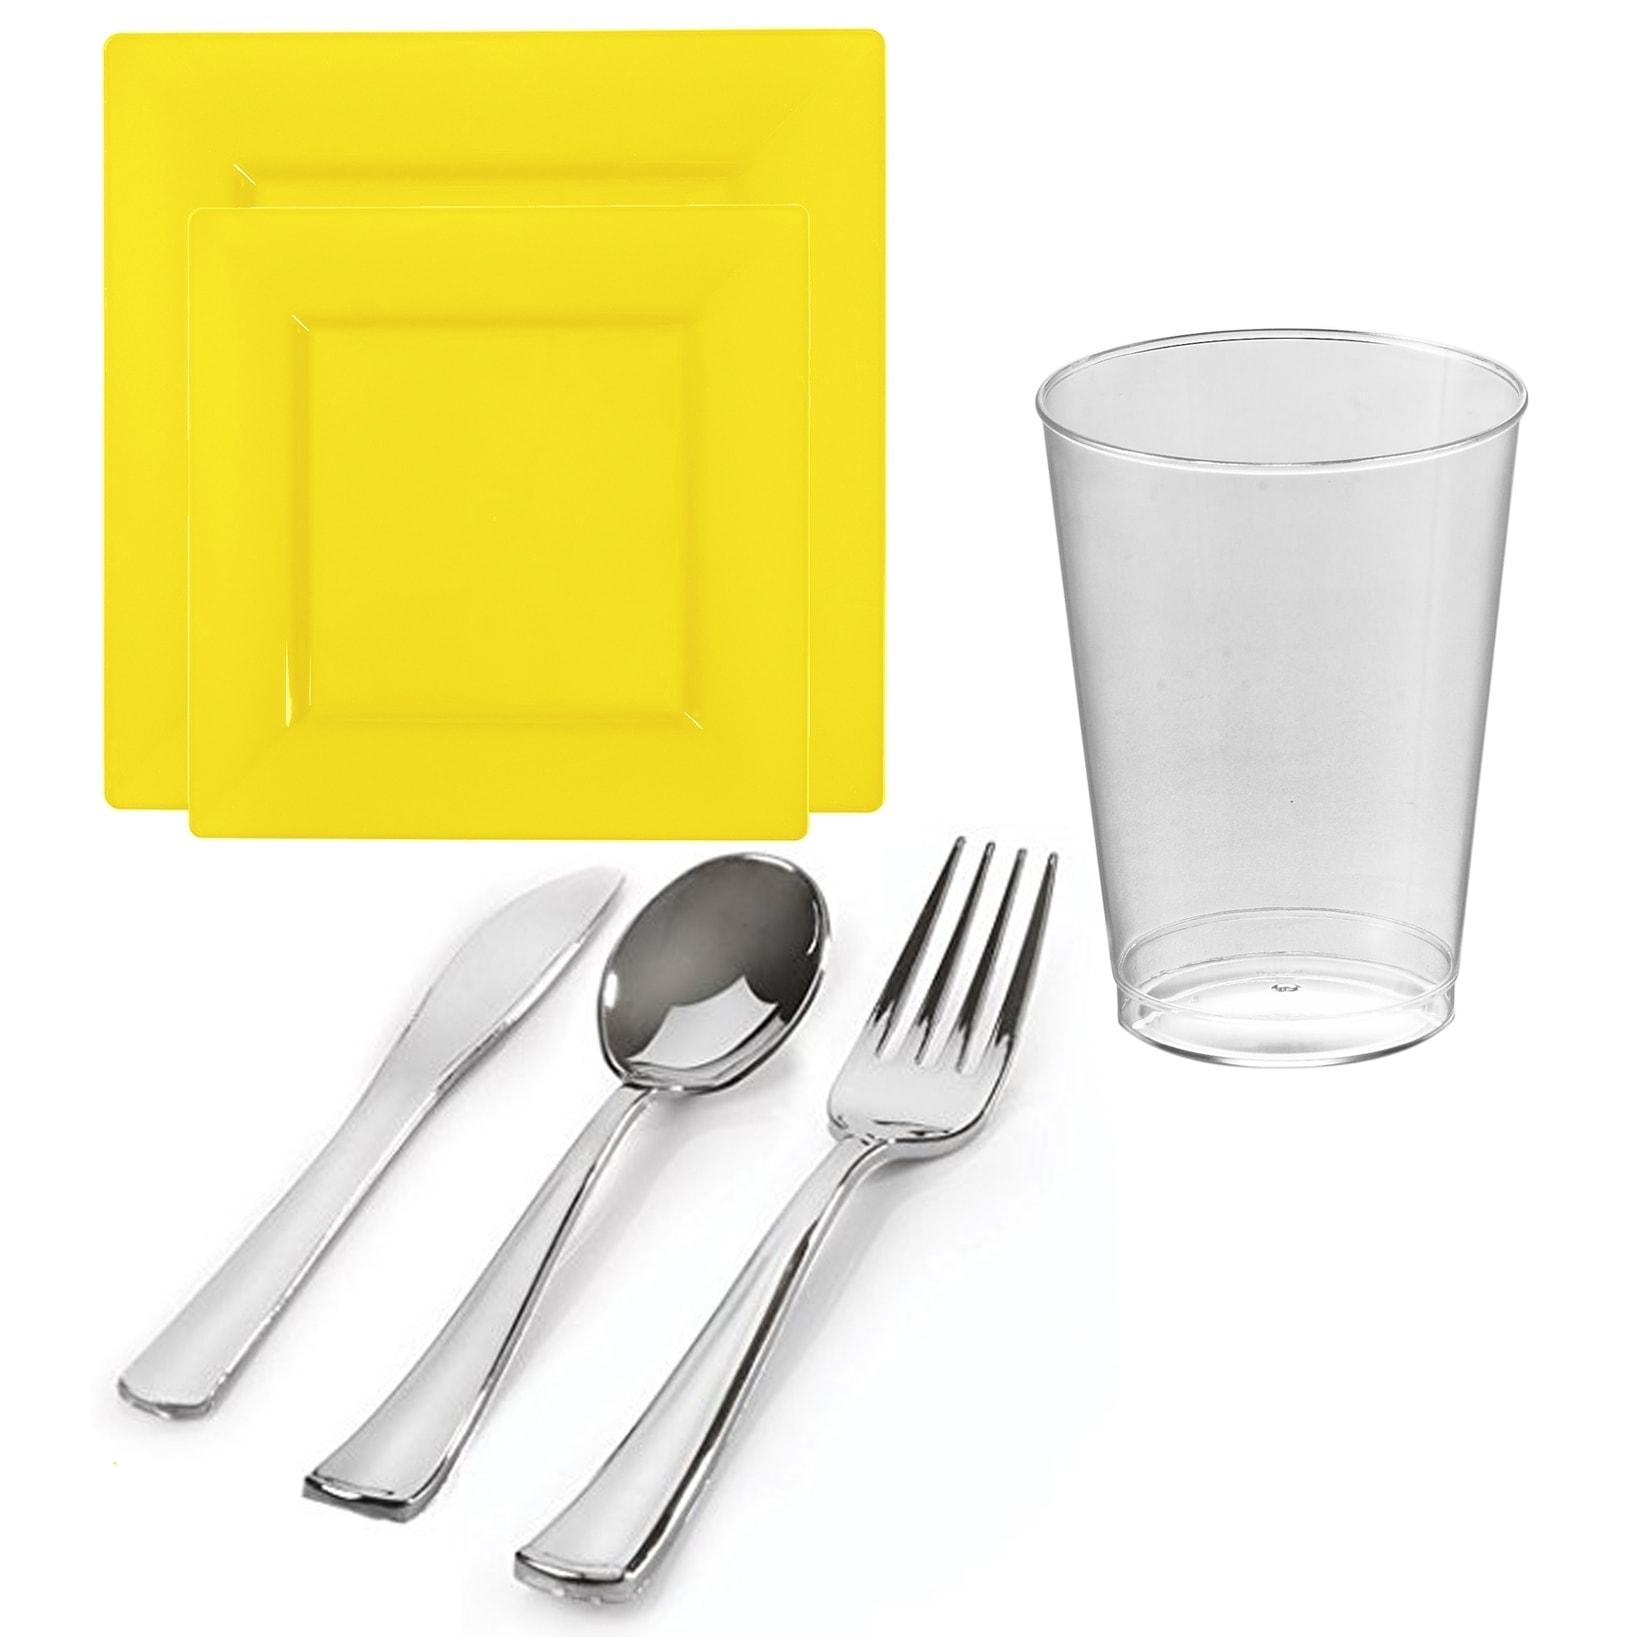 Buy Yellow Plates Online at Overstock.com | Our Best Dinnerware Deals